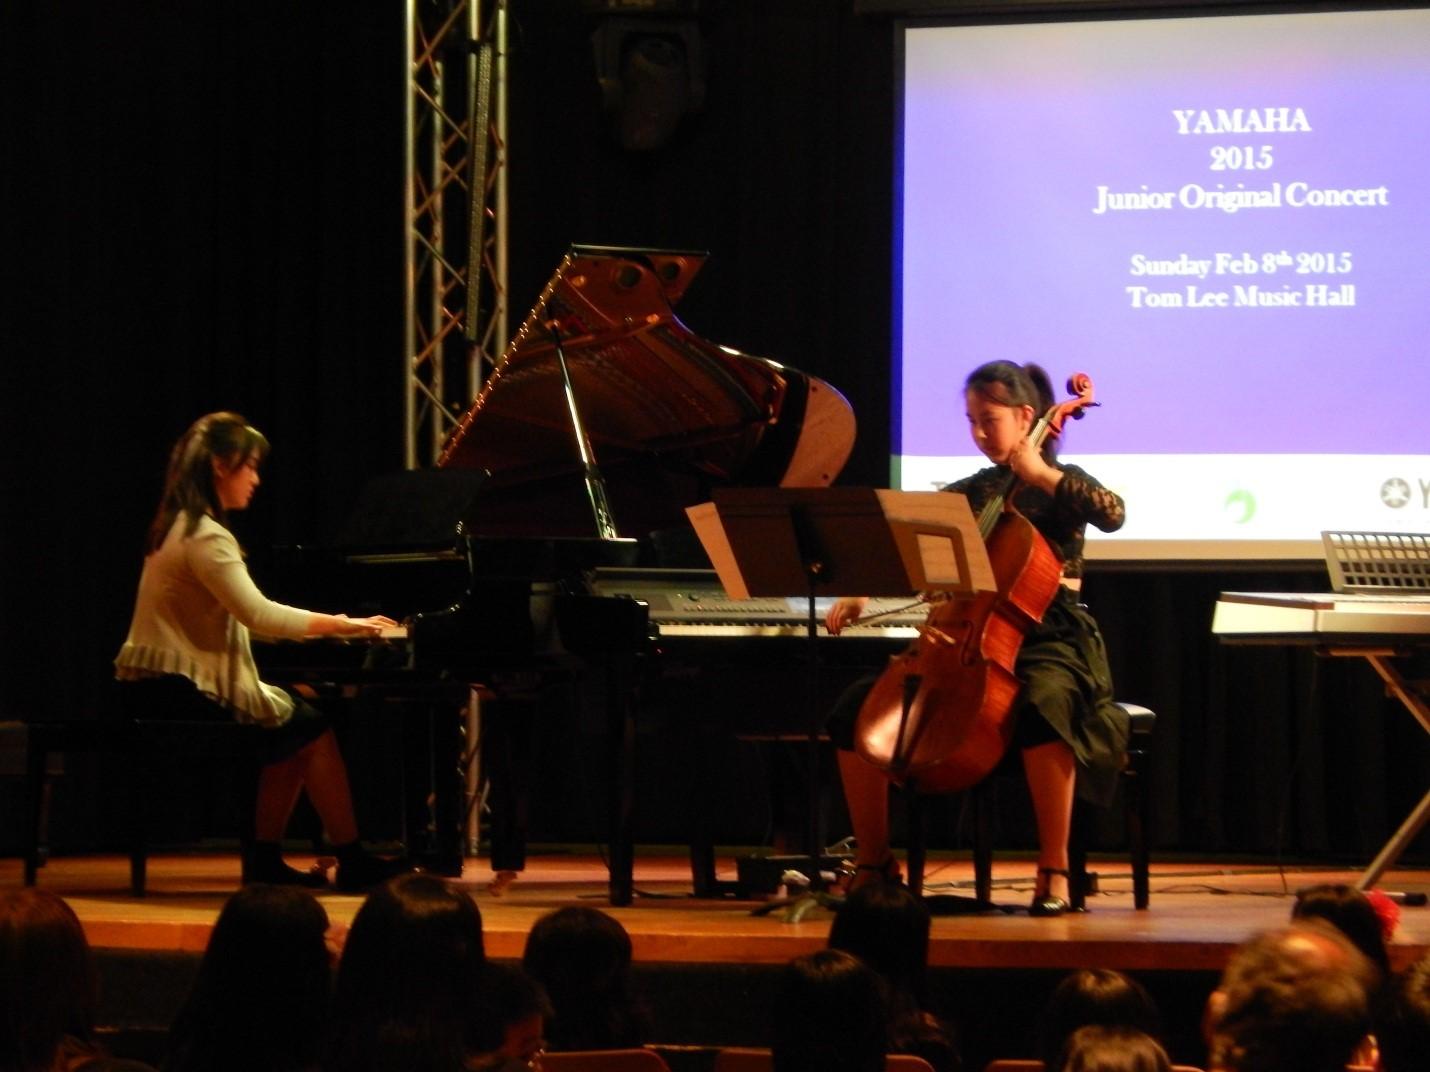 Tom lee music blog february 8 2015 vancouver yamaha for Yamaha music school los angeles